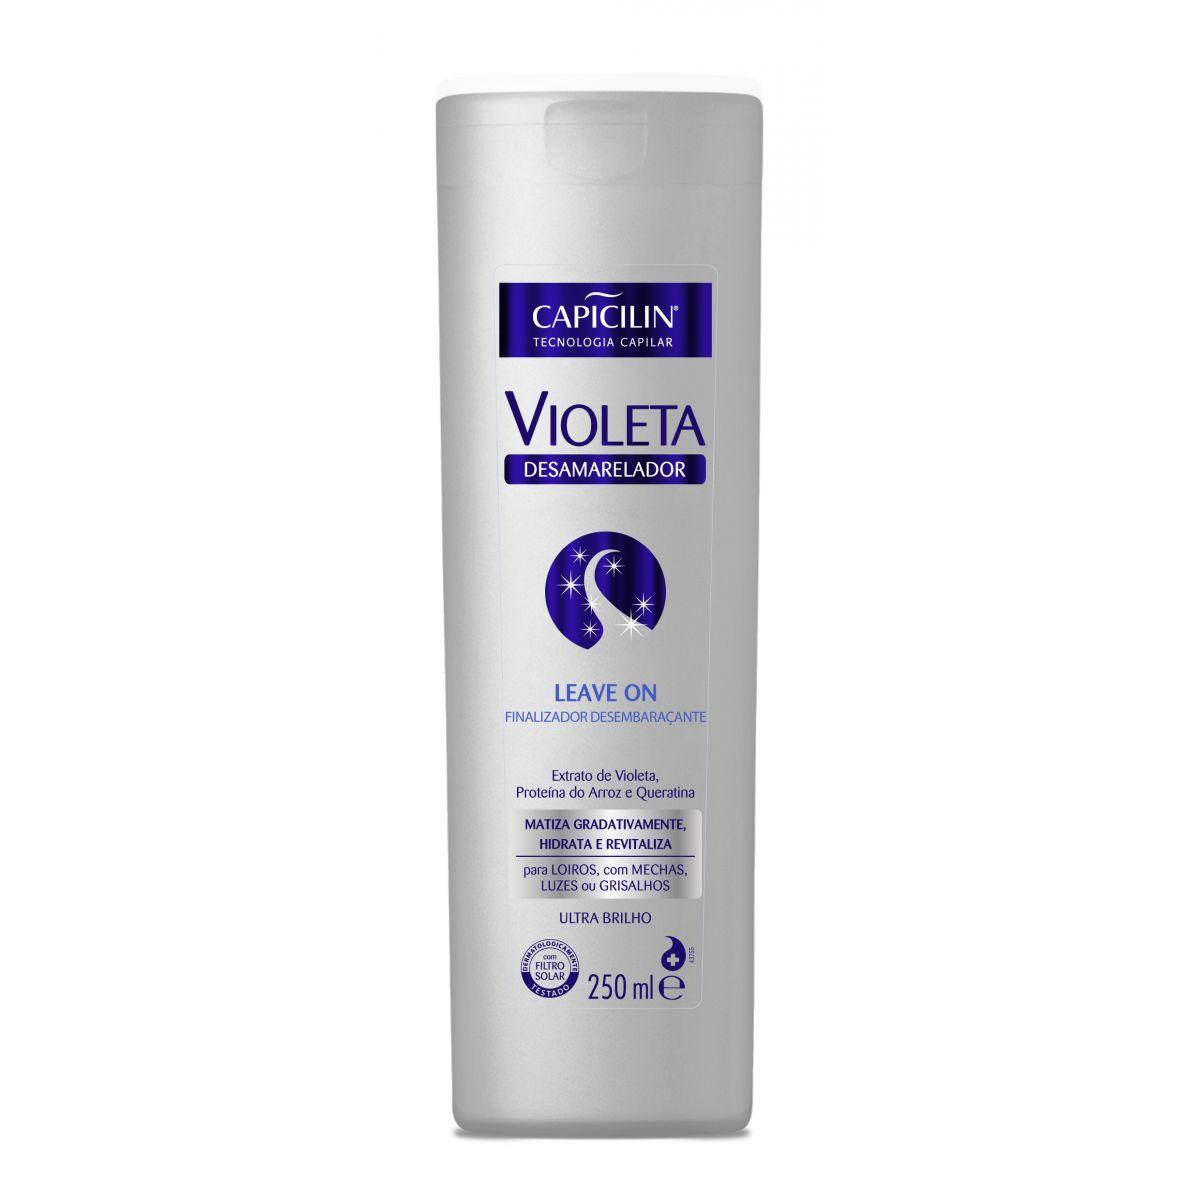 Leave On Violeta Desamarelador 250ml